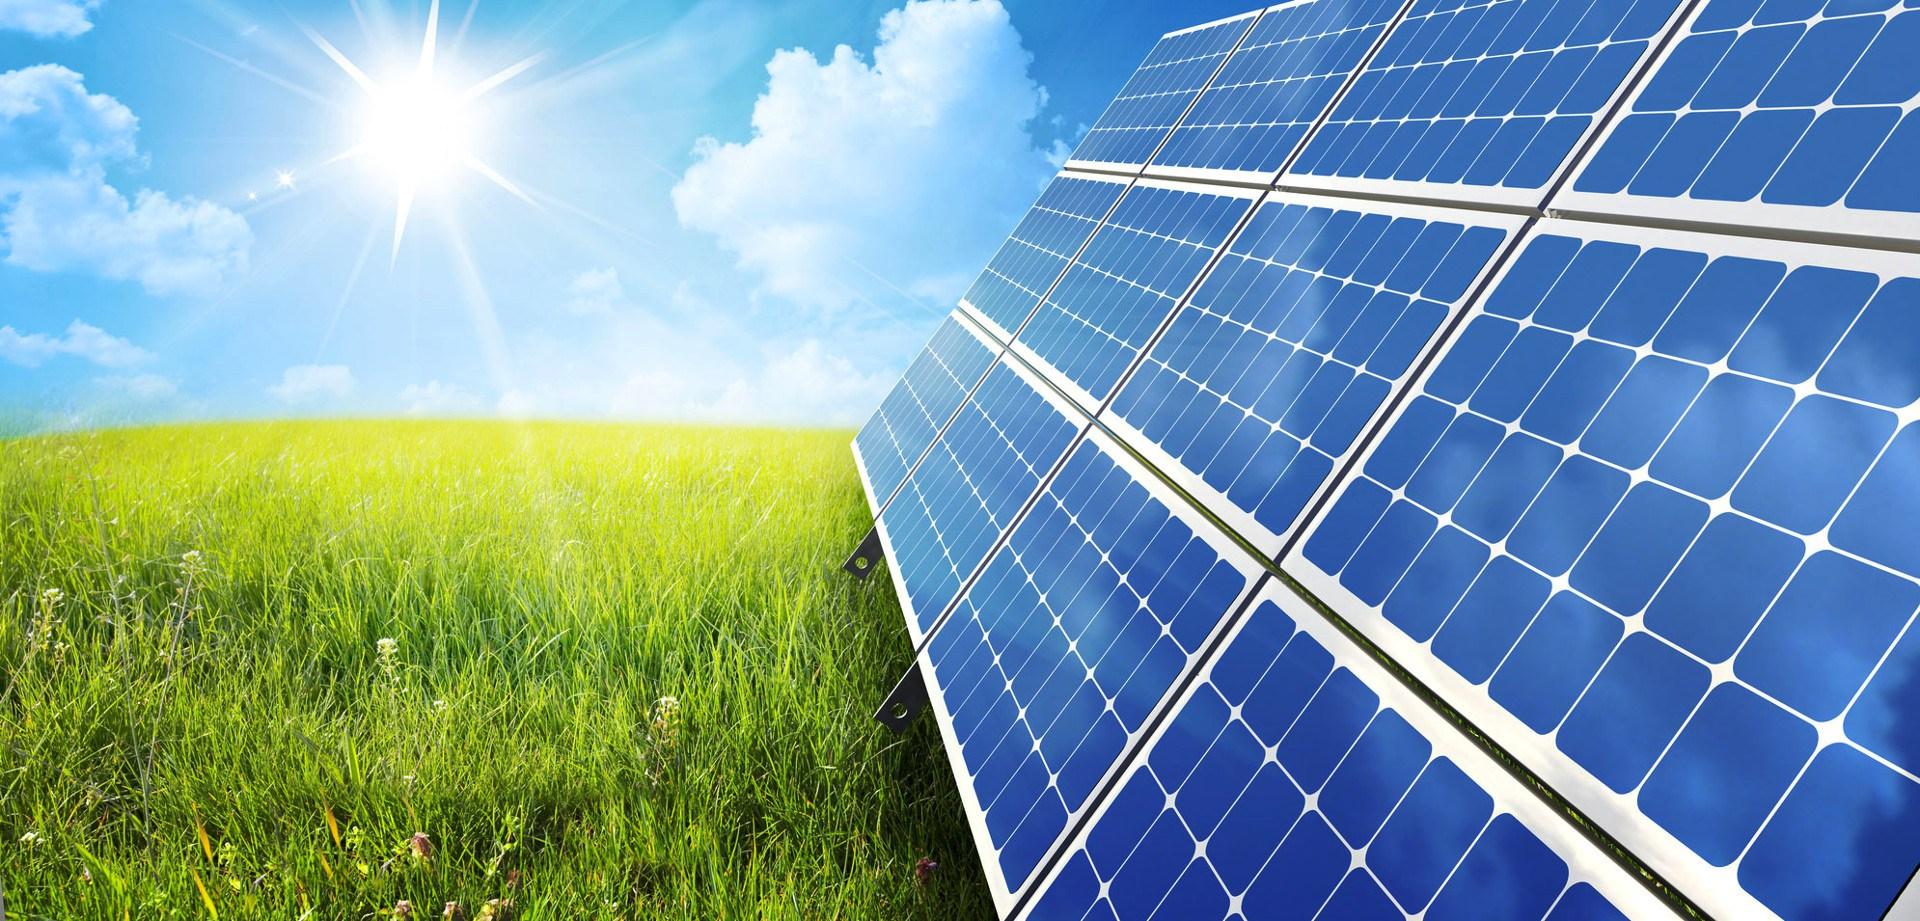 Energy Manager Verona Fotovoltaico - Sun Exchange: un mondo tra blockchain ed energia rinnovabile